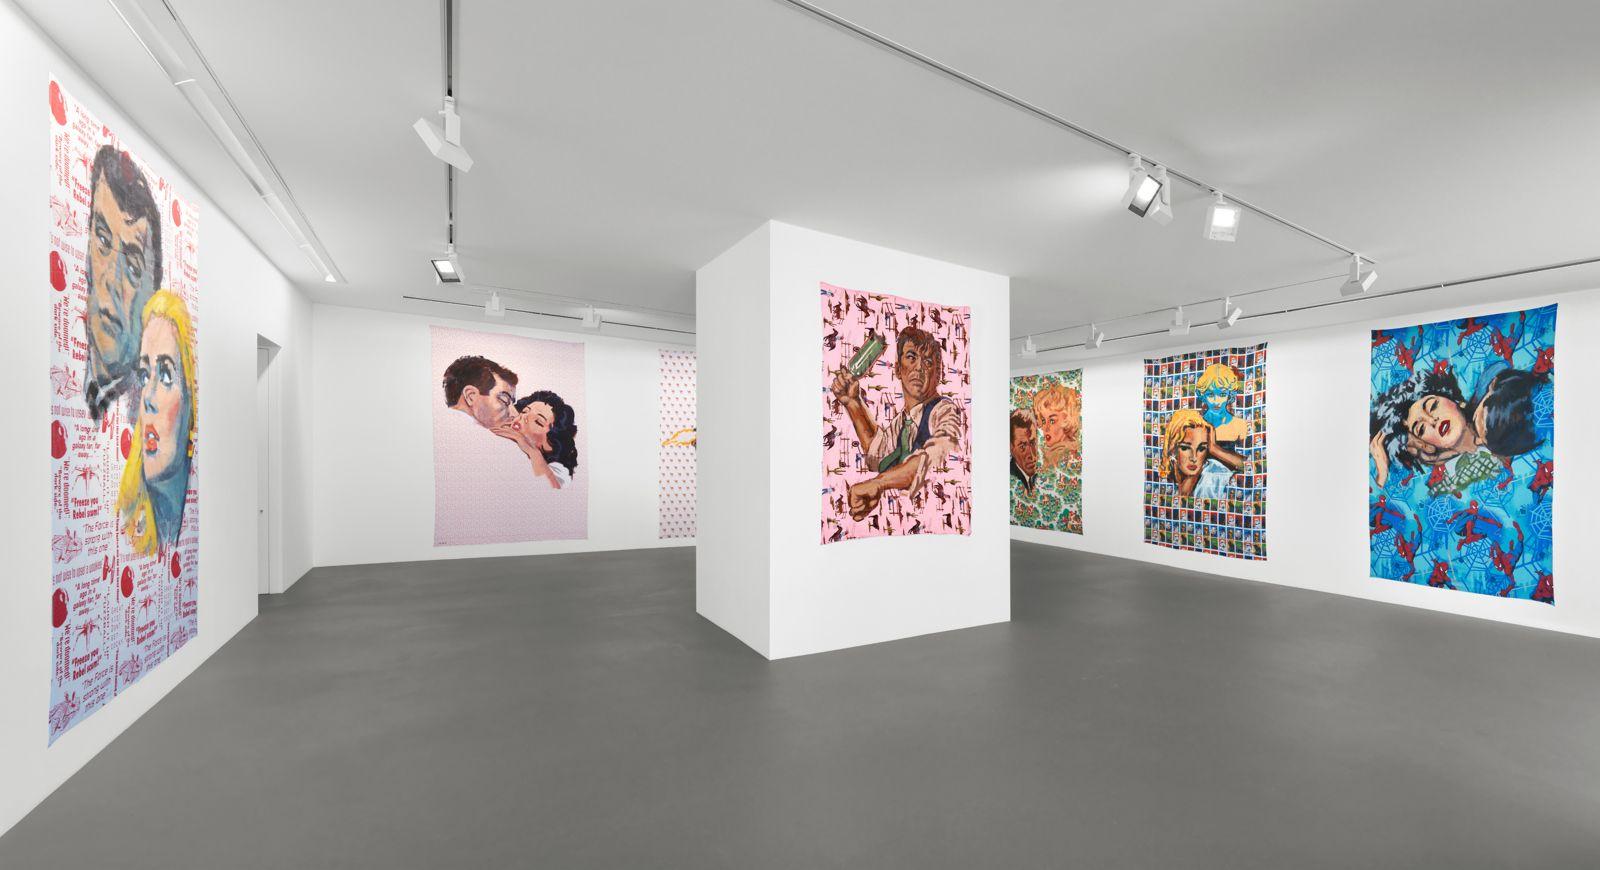 Installation view, Walter Robinson, The Americans, Vito Schnabel Gallery, St. Moritz, 2017